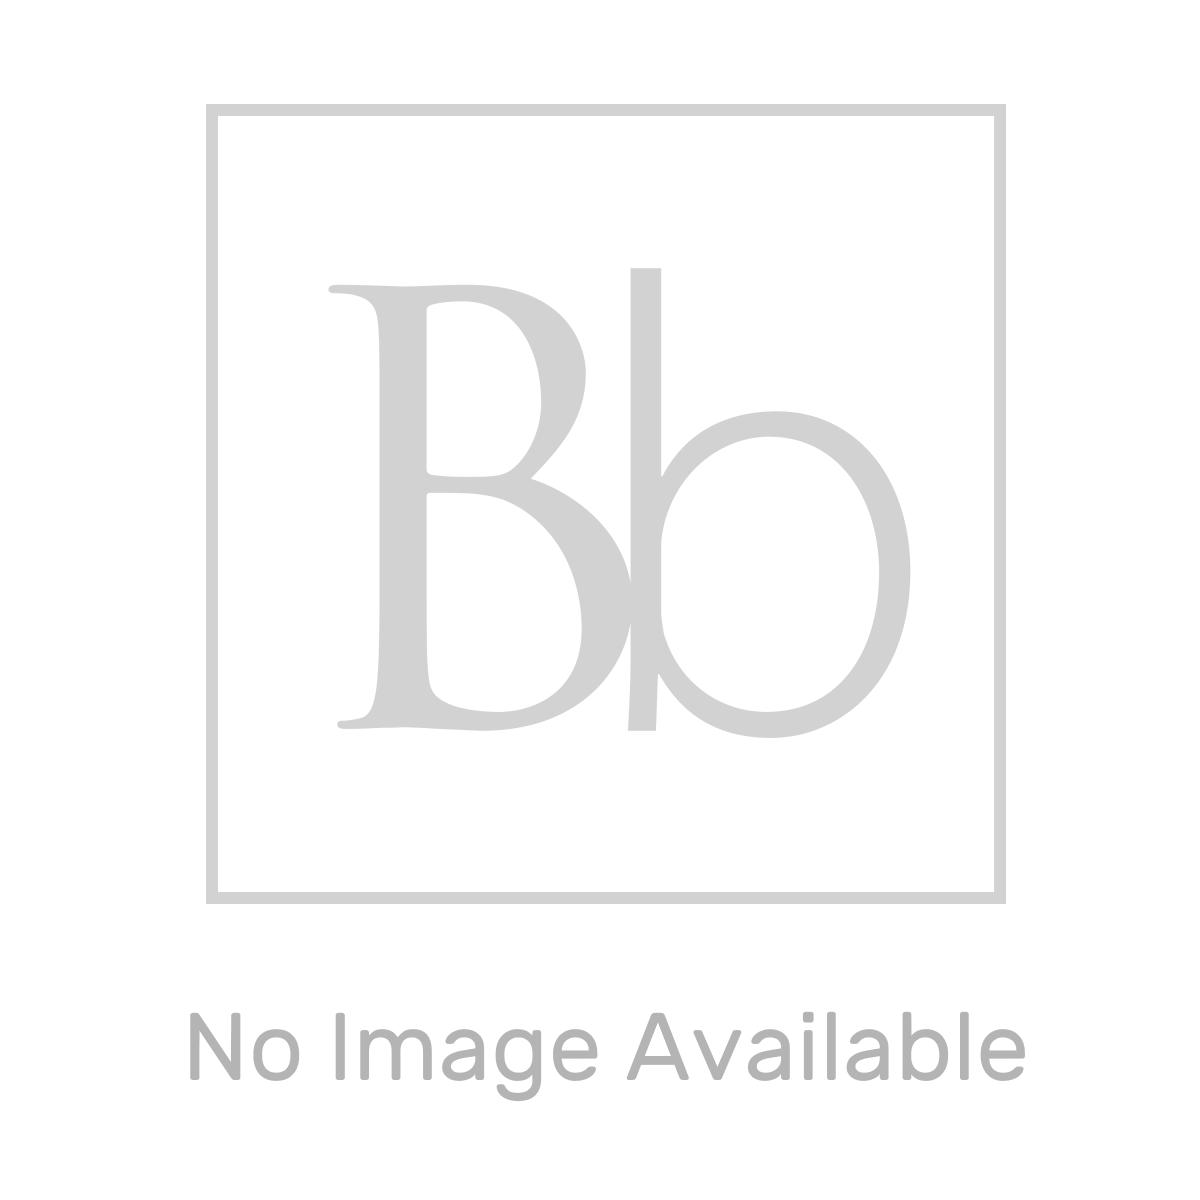 RAK Series 600 Close Coupled Toilet and 400 Series Medium Oak Mini Vanity Unit